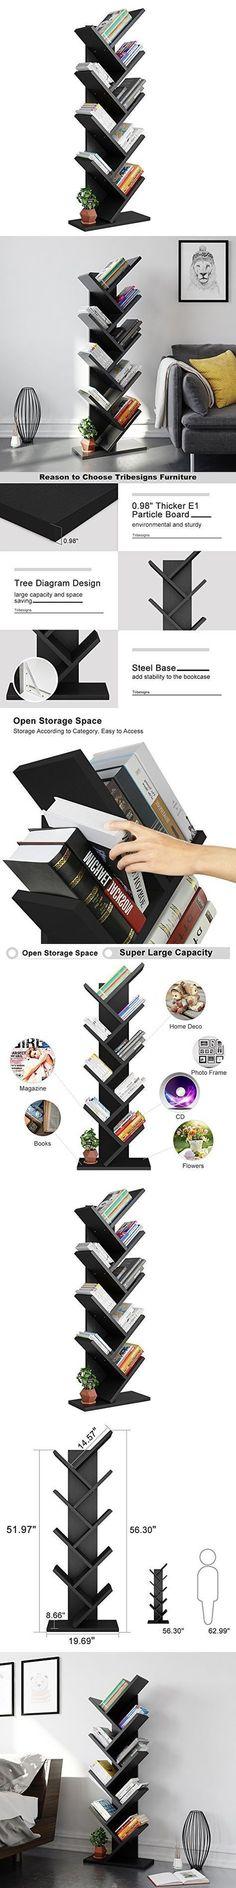 Tribesigns 9-Shelf Tree Shaped Bookcase Book Shelf Modern Stylish Kids Children Bookshelf Shelving Display Storage Rack for CD Book Home Office Decor (Black) #FunkyHomeDecor